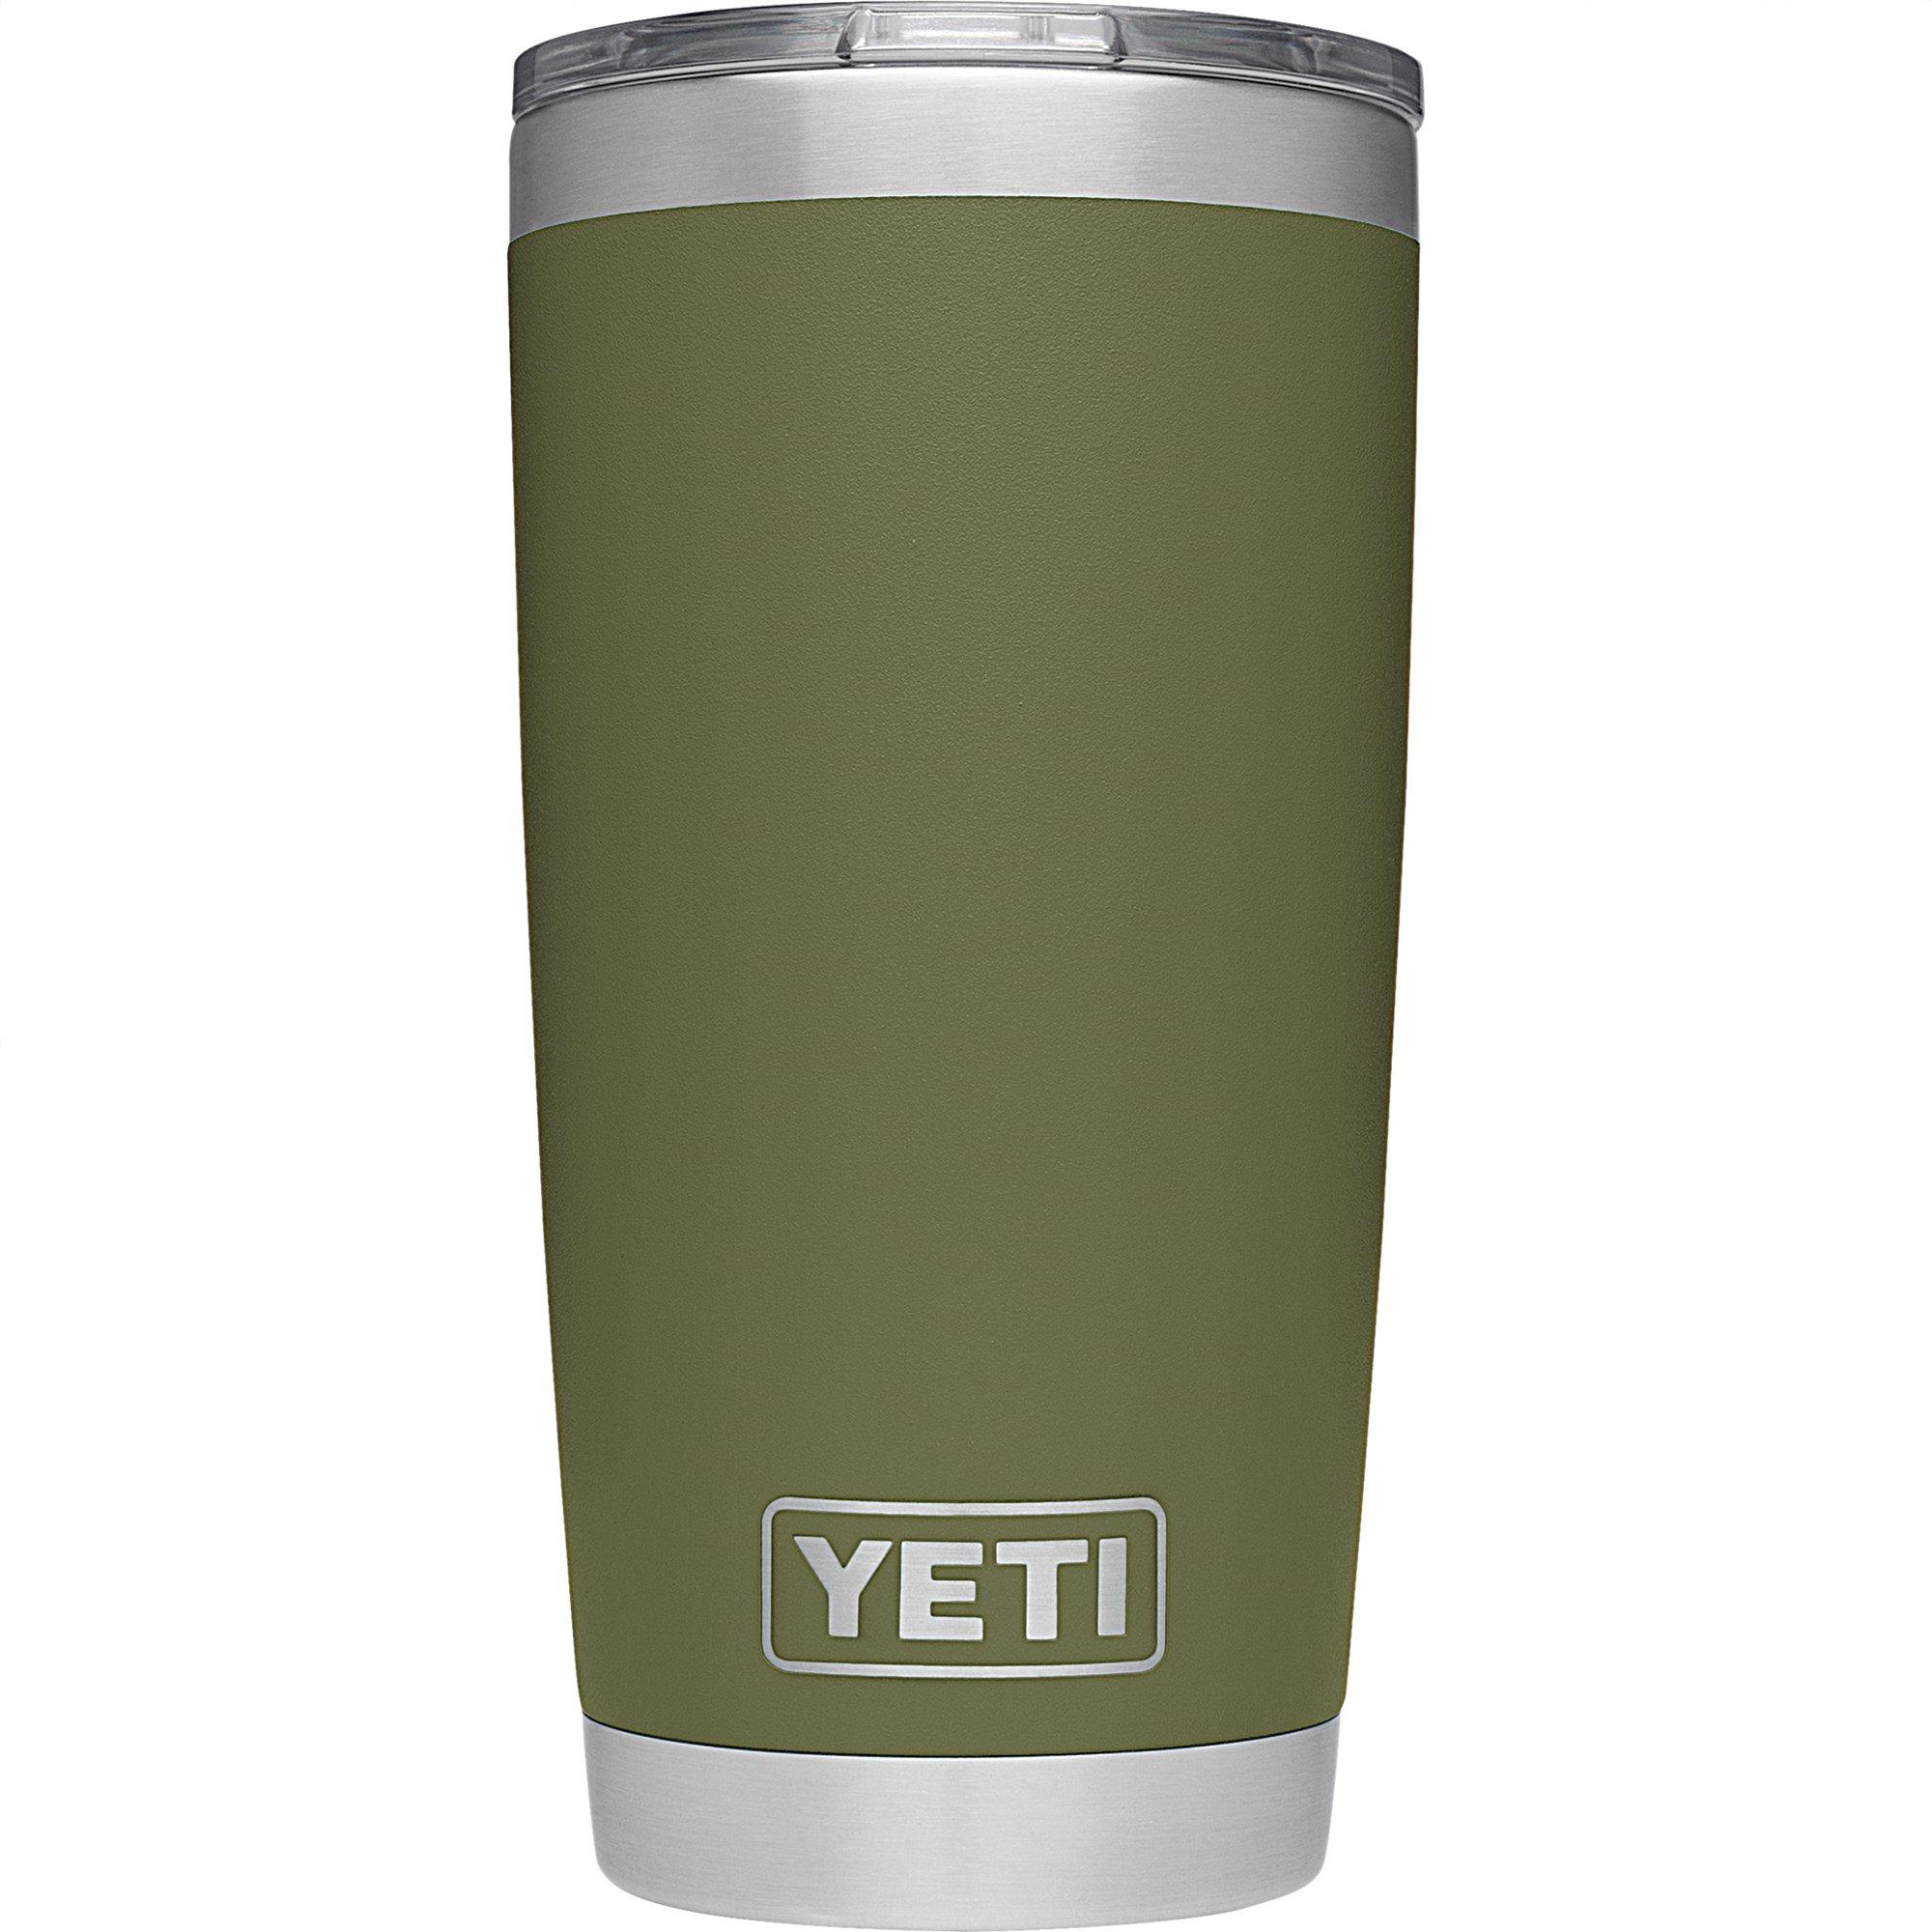 YETI Tumbler Rambler 20Oz Olive Green, 1 Each